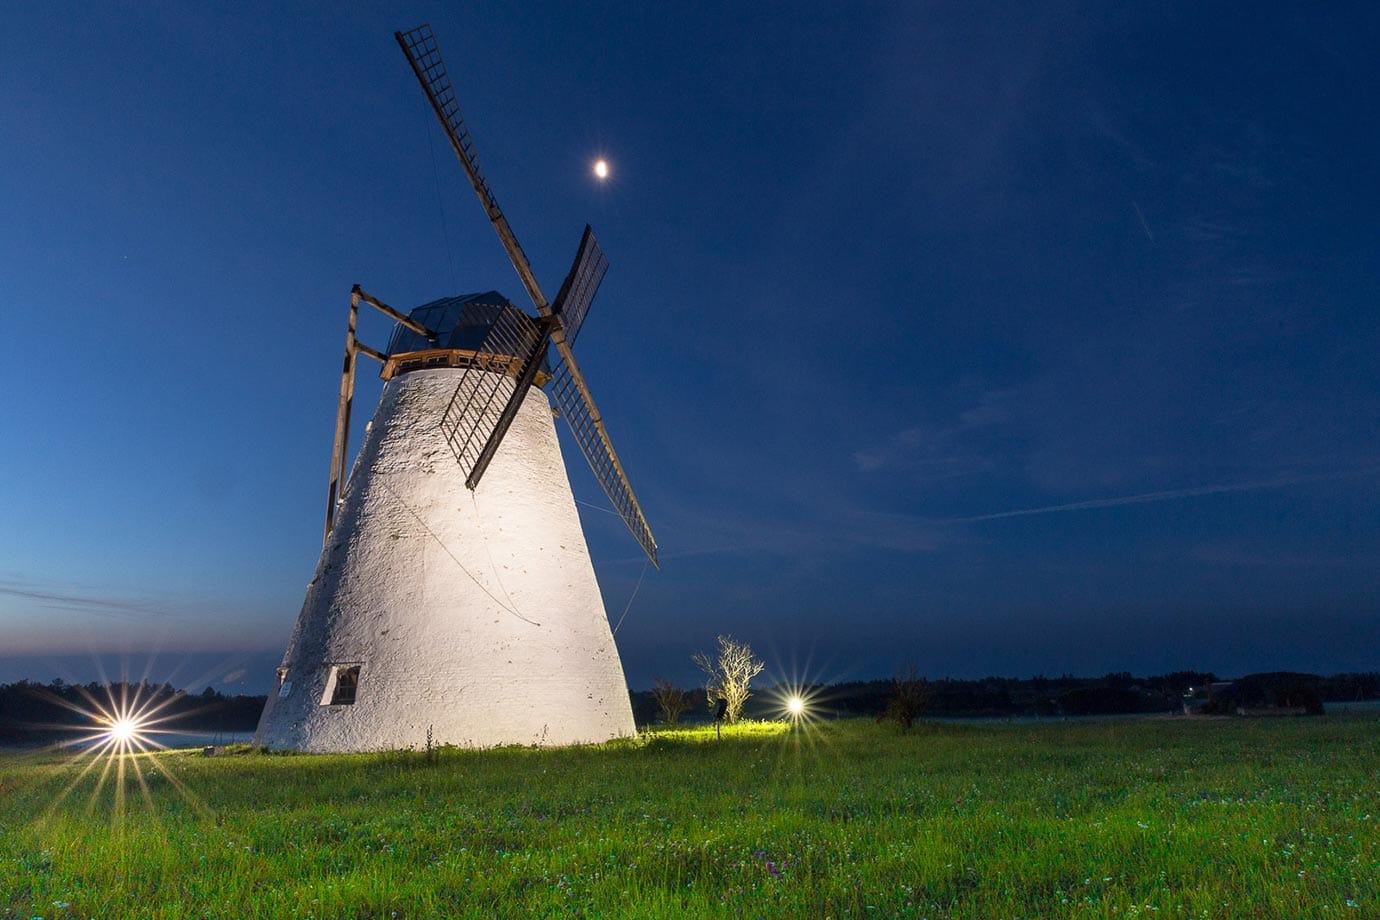 Countryside of Estonia